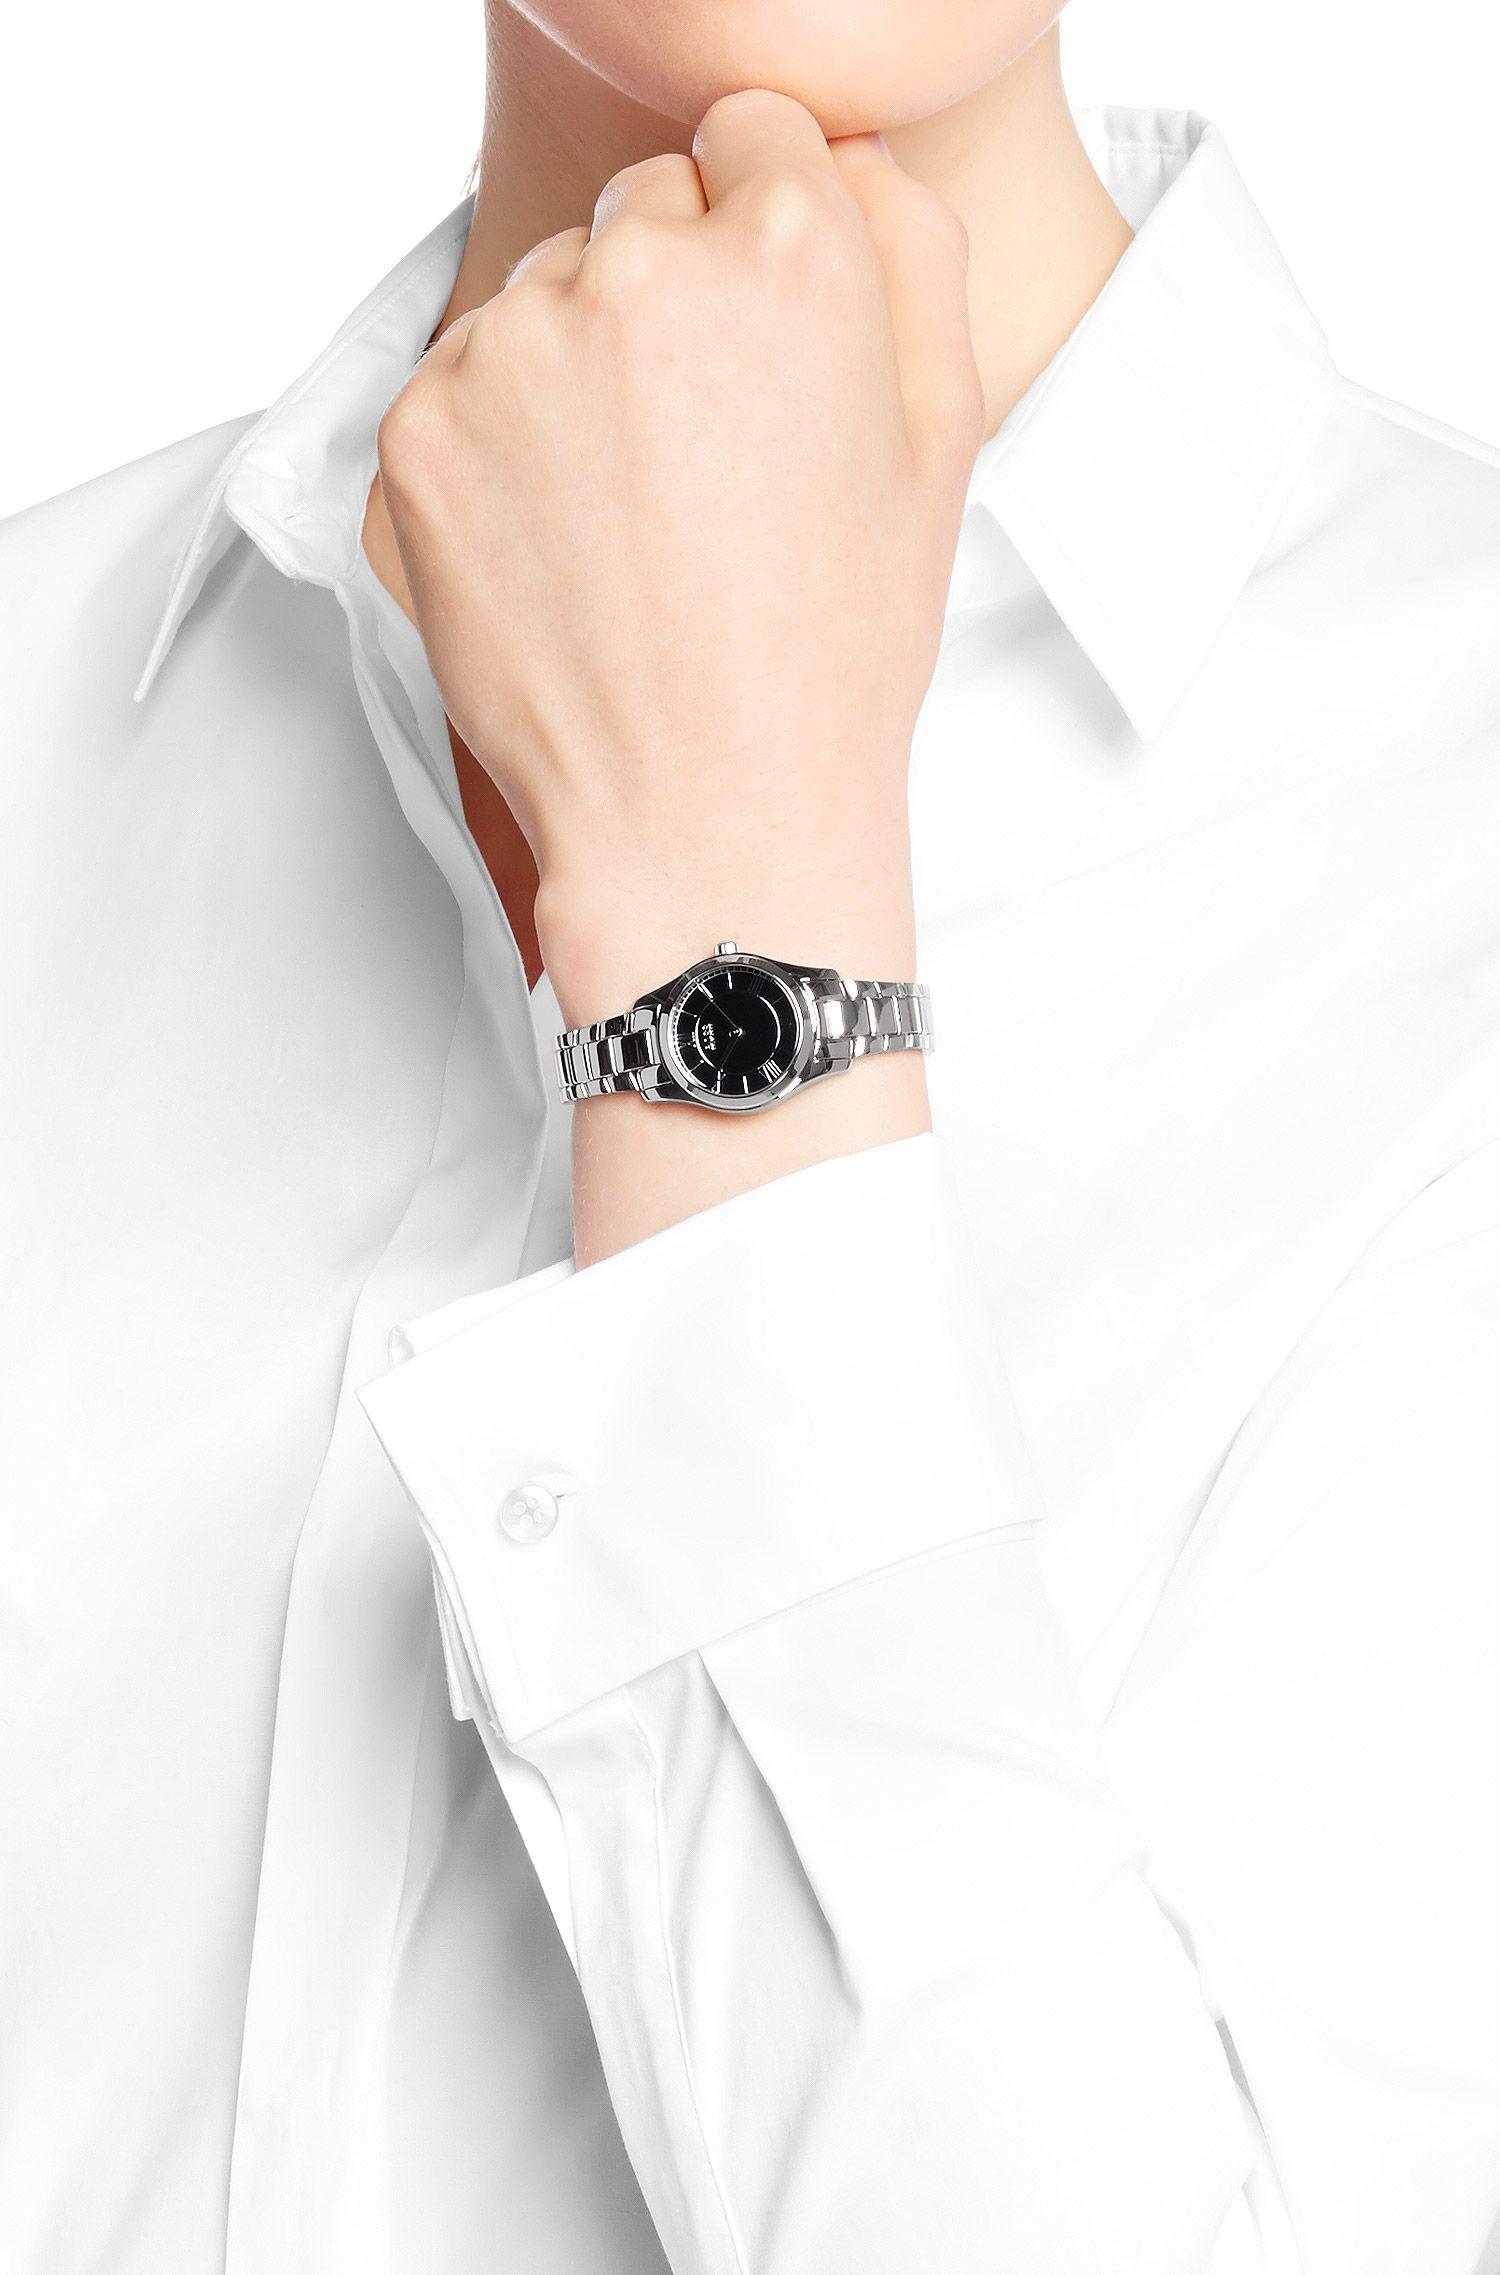 Montre-bracelet «HBAMBRL» en acier inox brillant